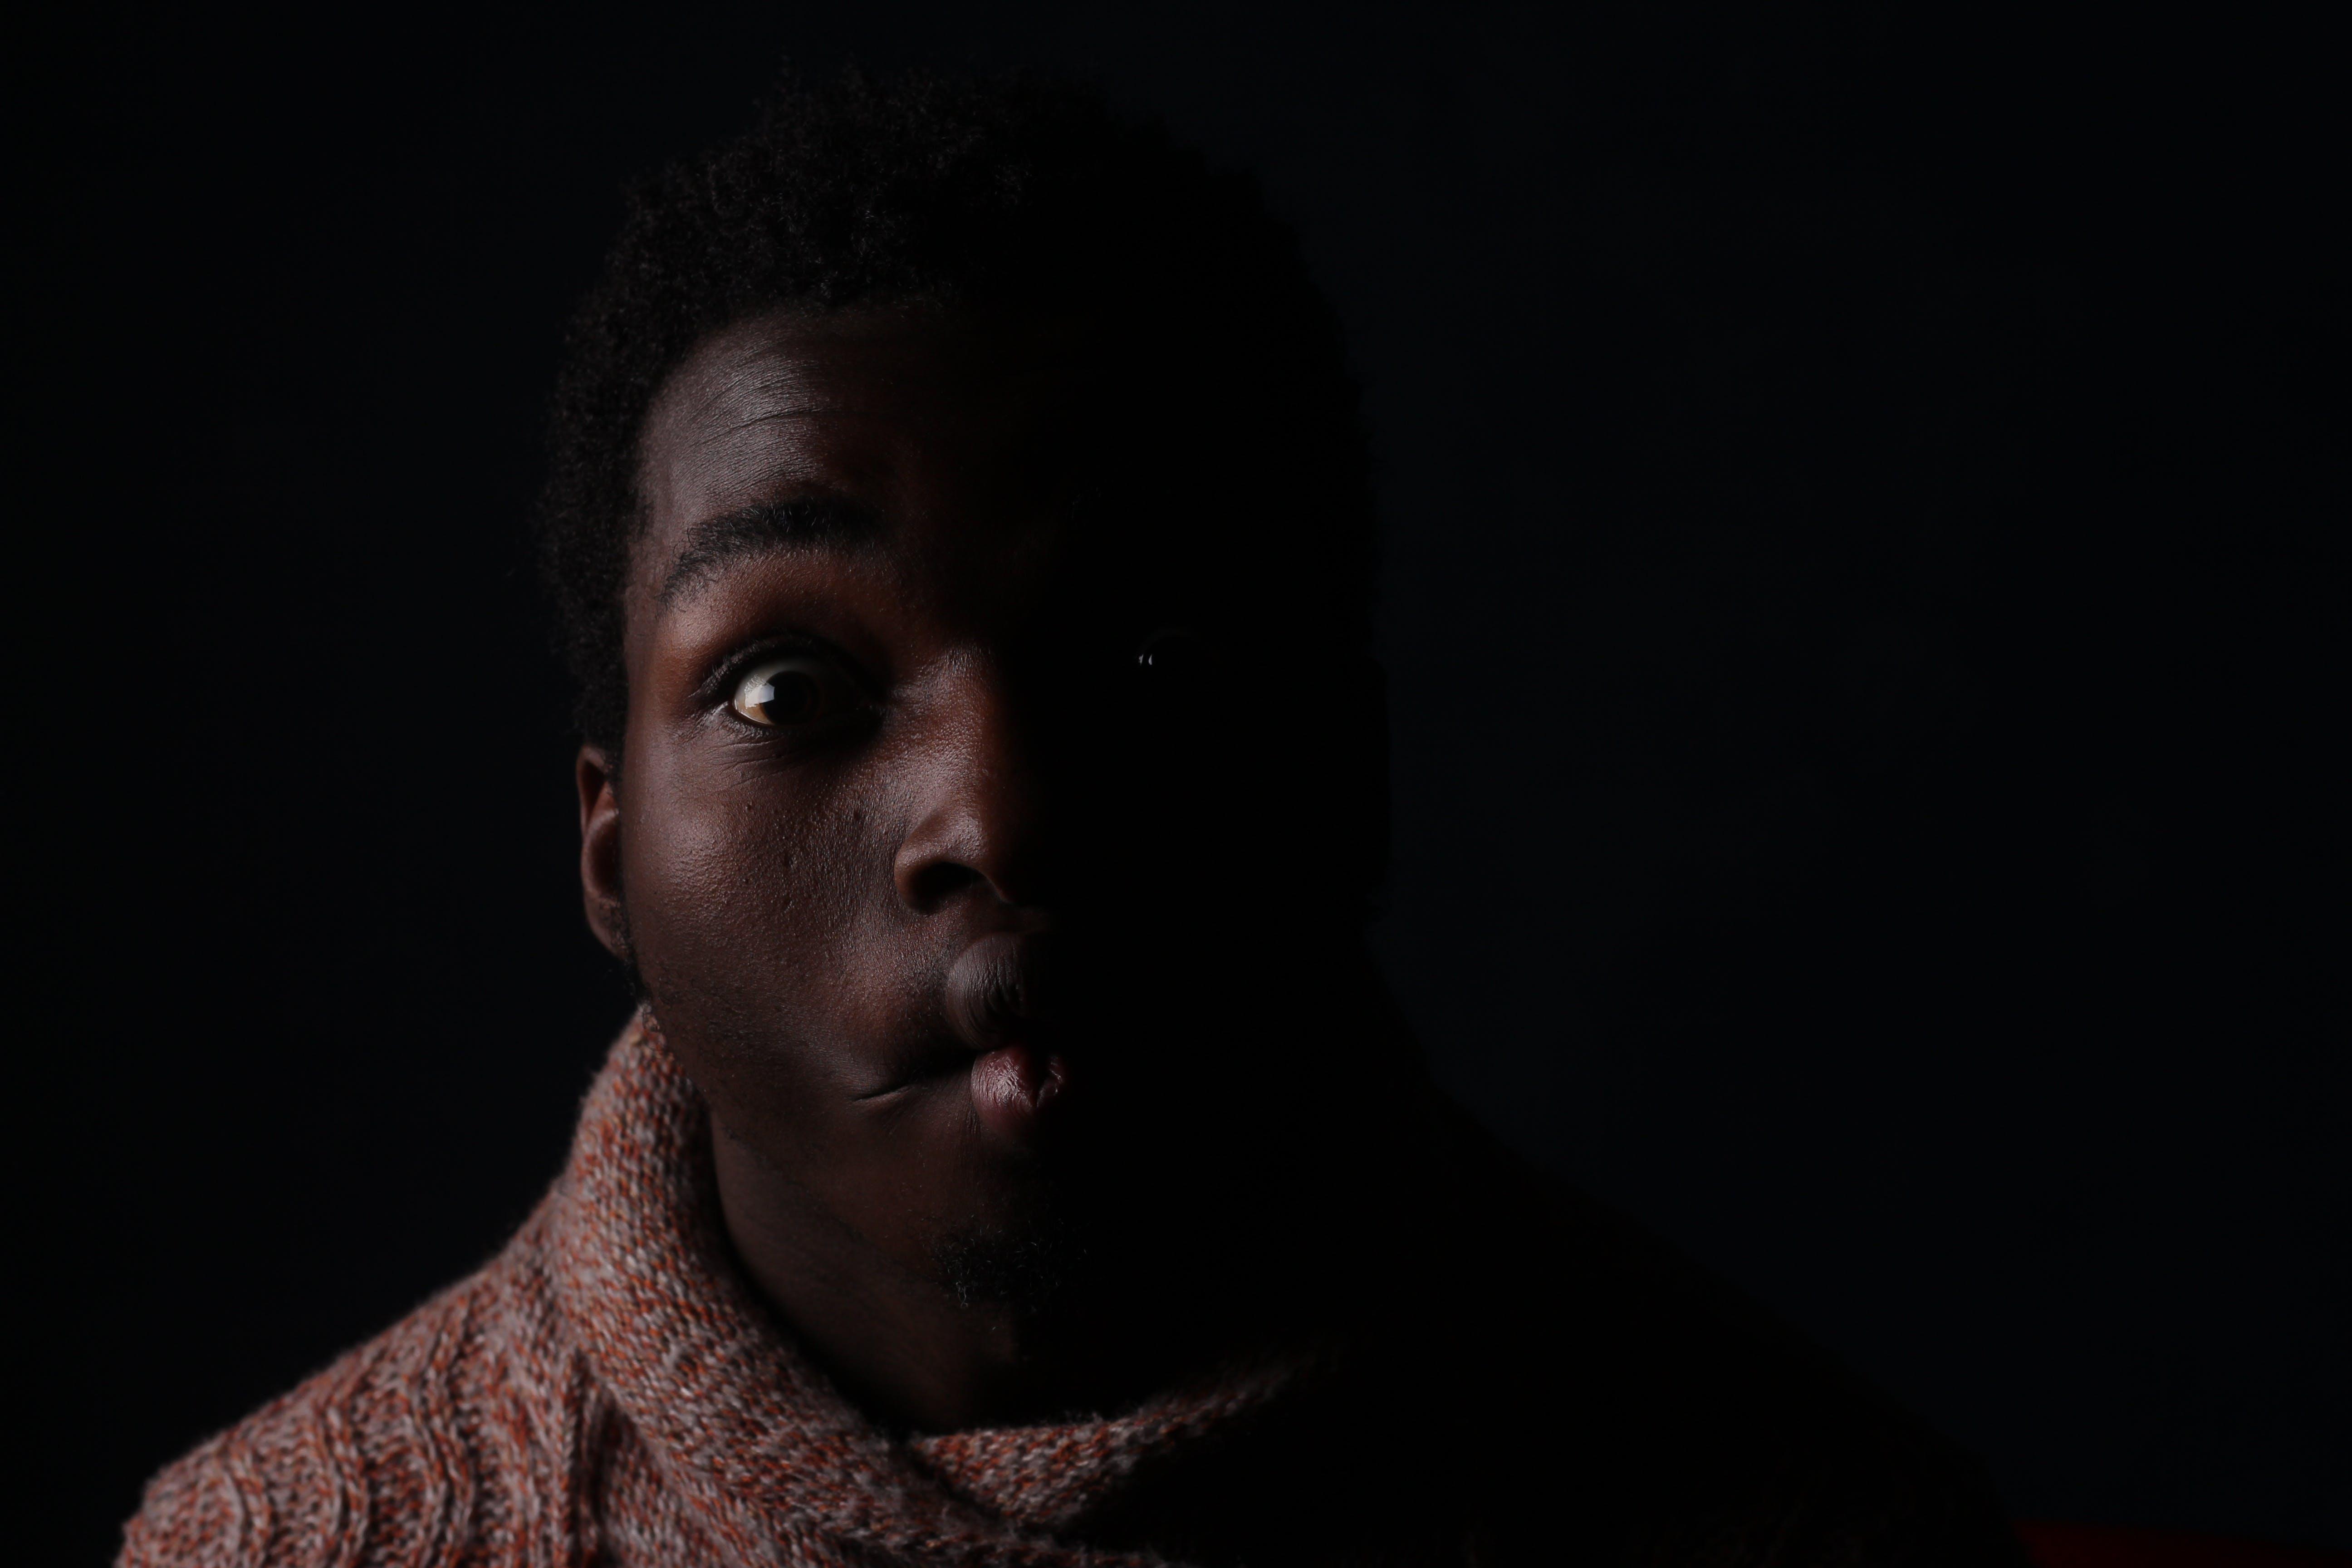 Close-up Photo of Man Making Face